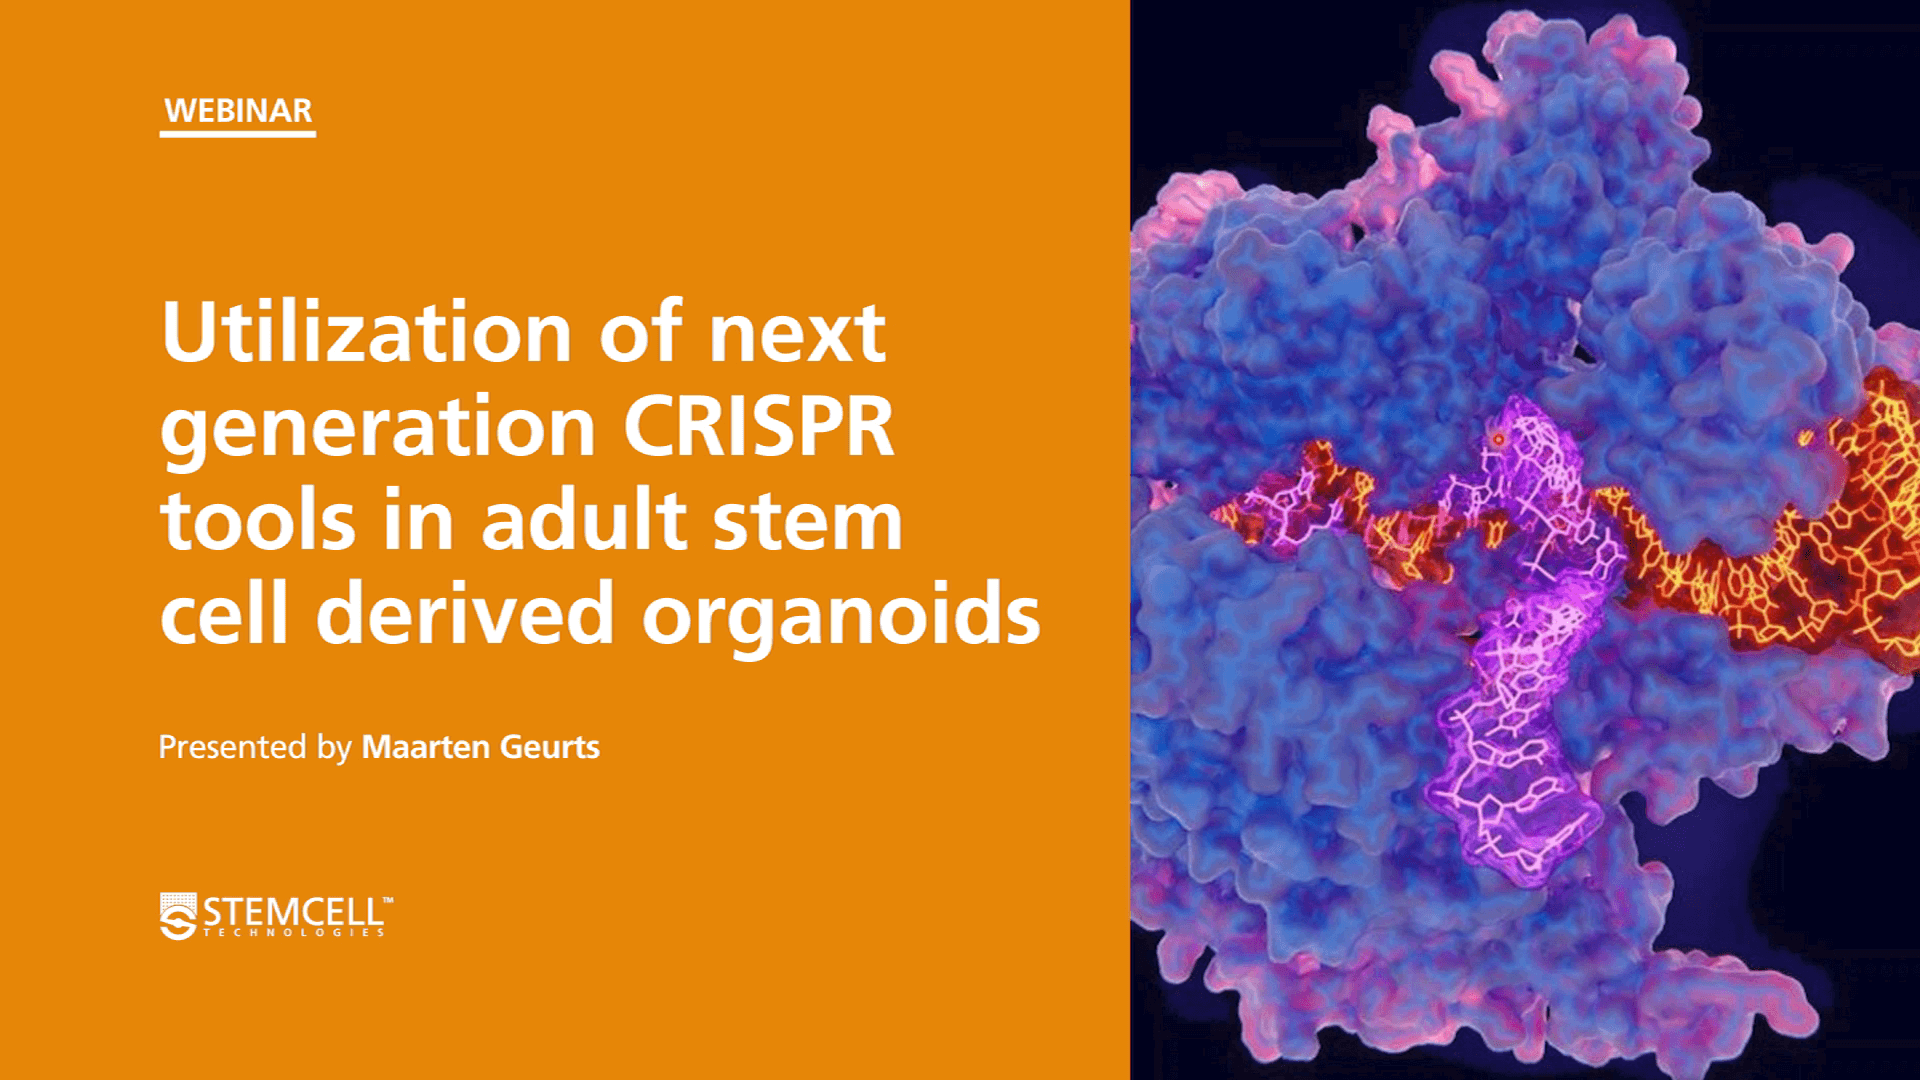 Organoid Mini-Symposium: Utilization of Next Generation CRISPR Tools to Model Health and Disease in Adult Stem Cell-Derived Organoids